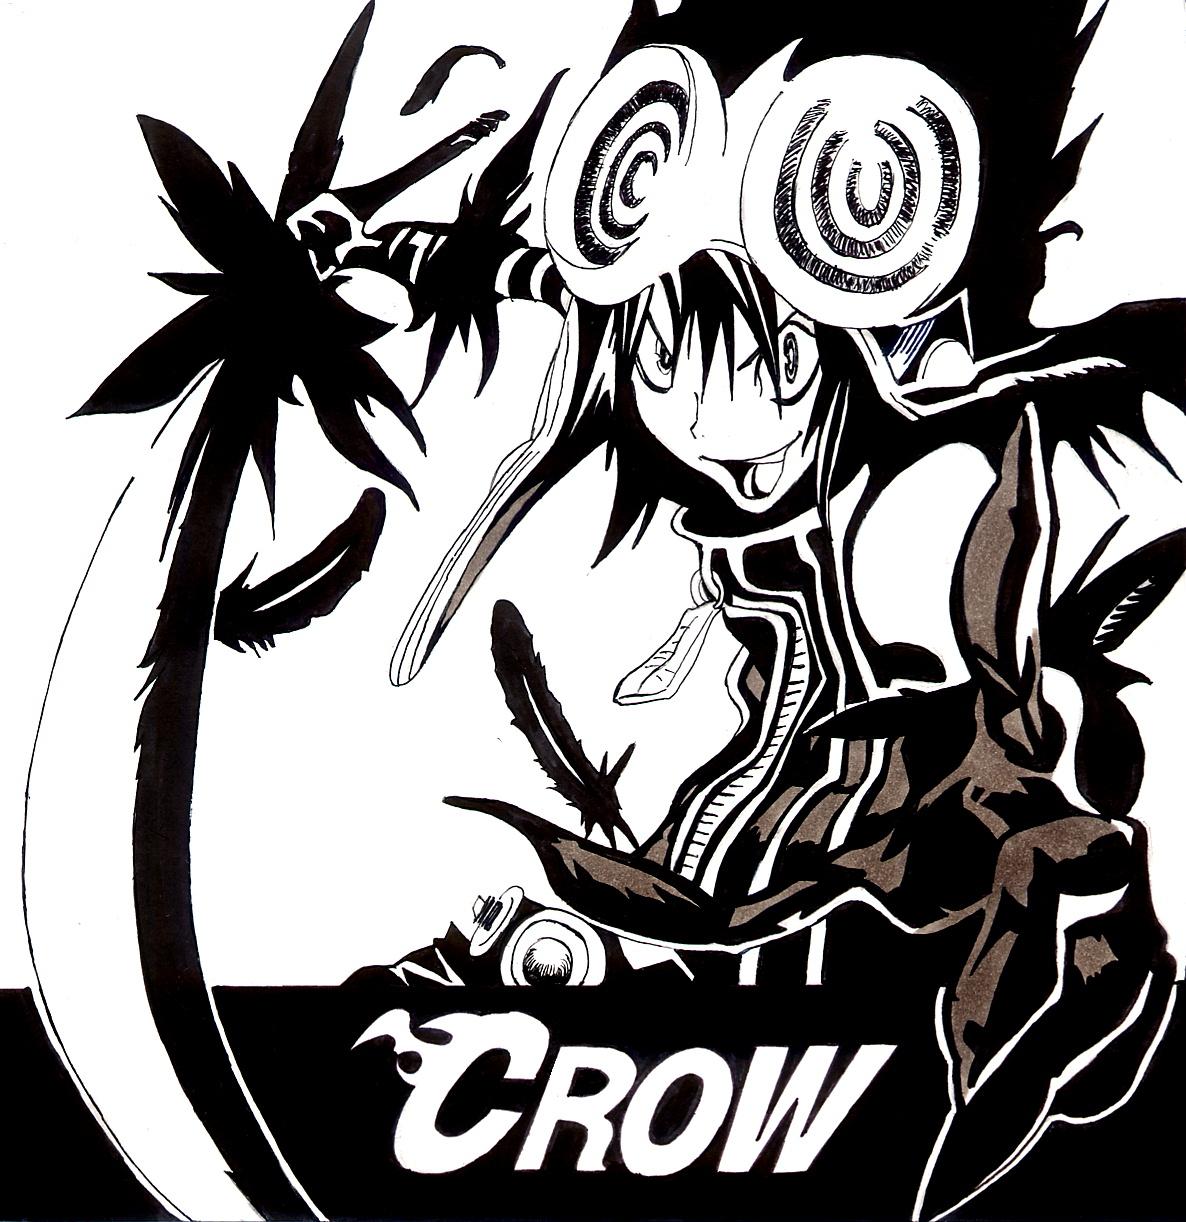 Crow (Character)